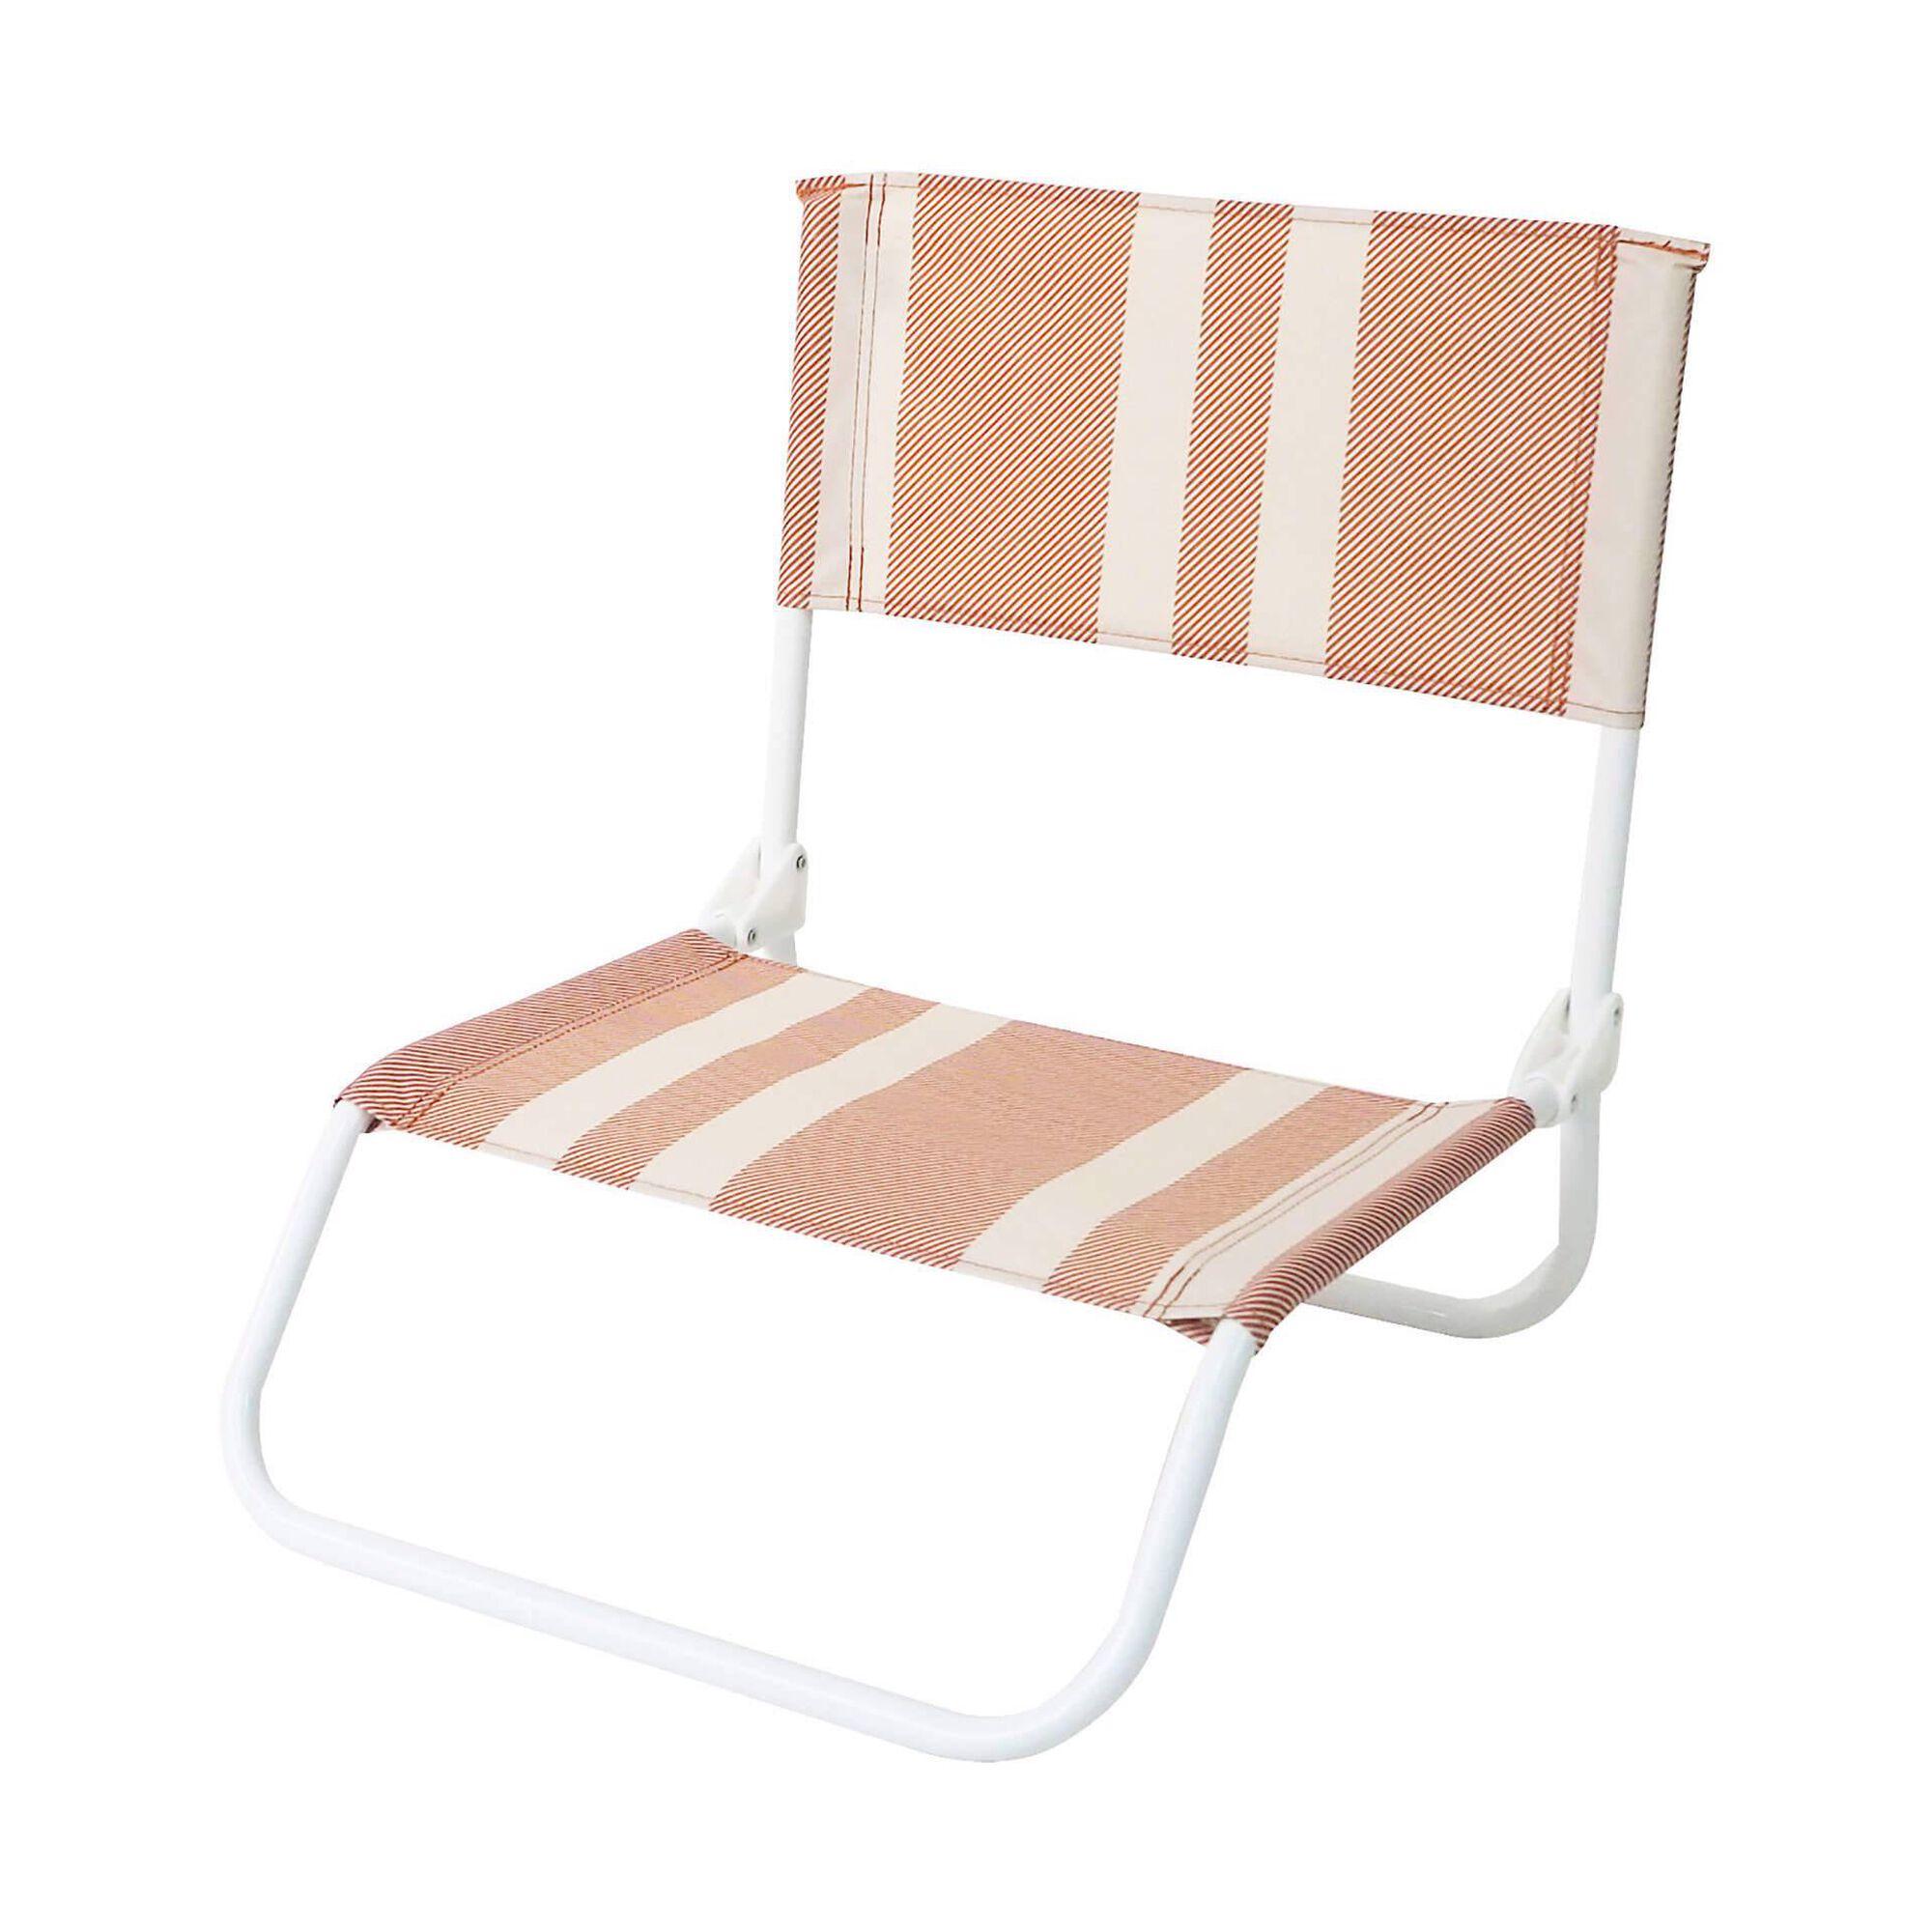 Cadeira de Praia Lona Coral Malibu